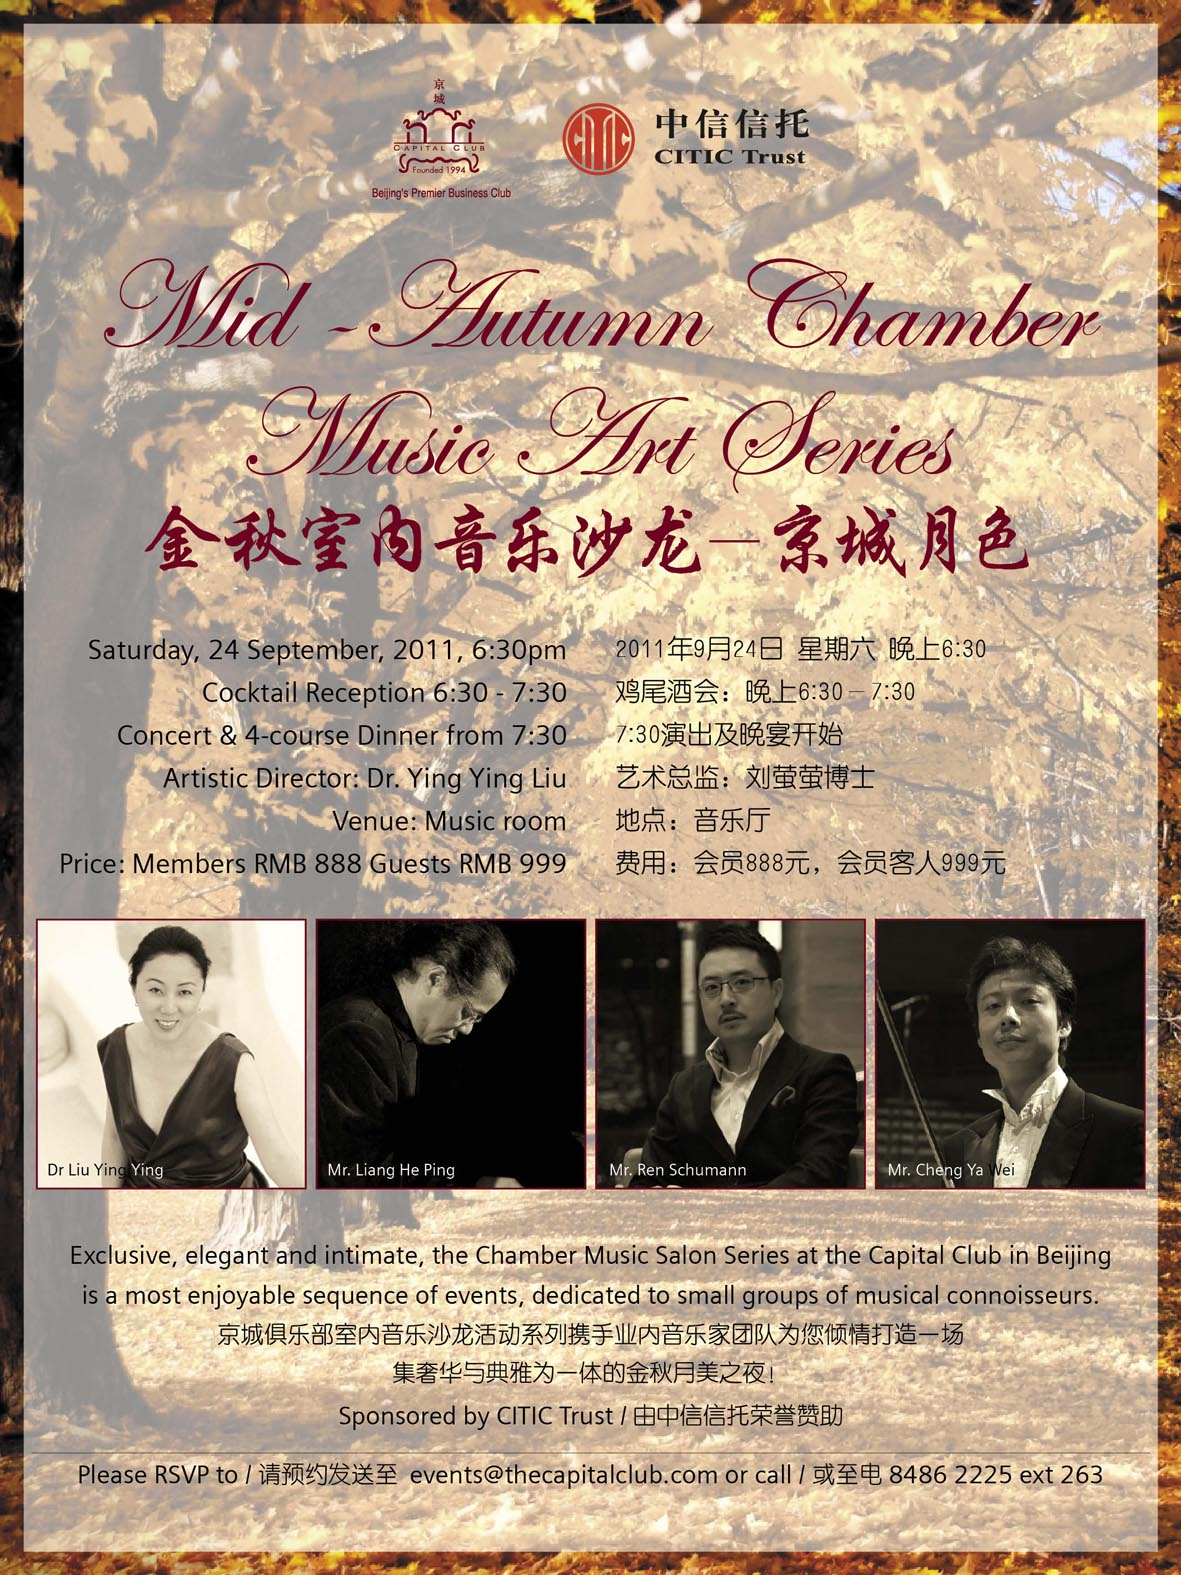 Beijing Capital Club Chamber Music Series